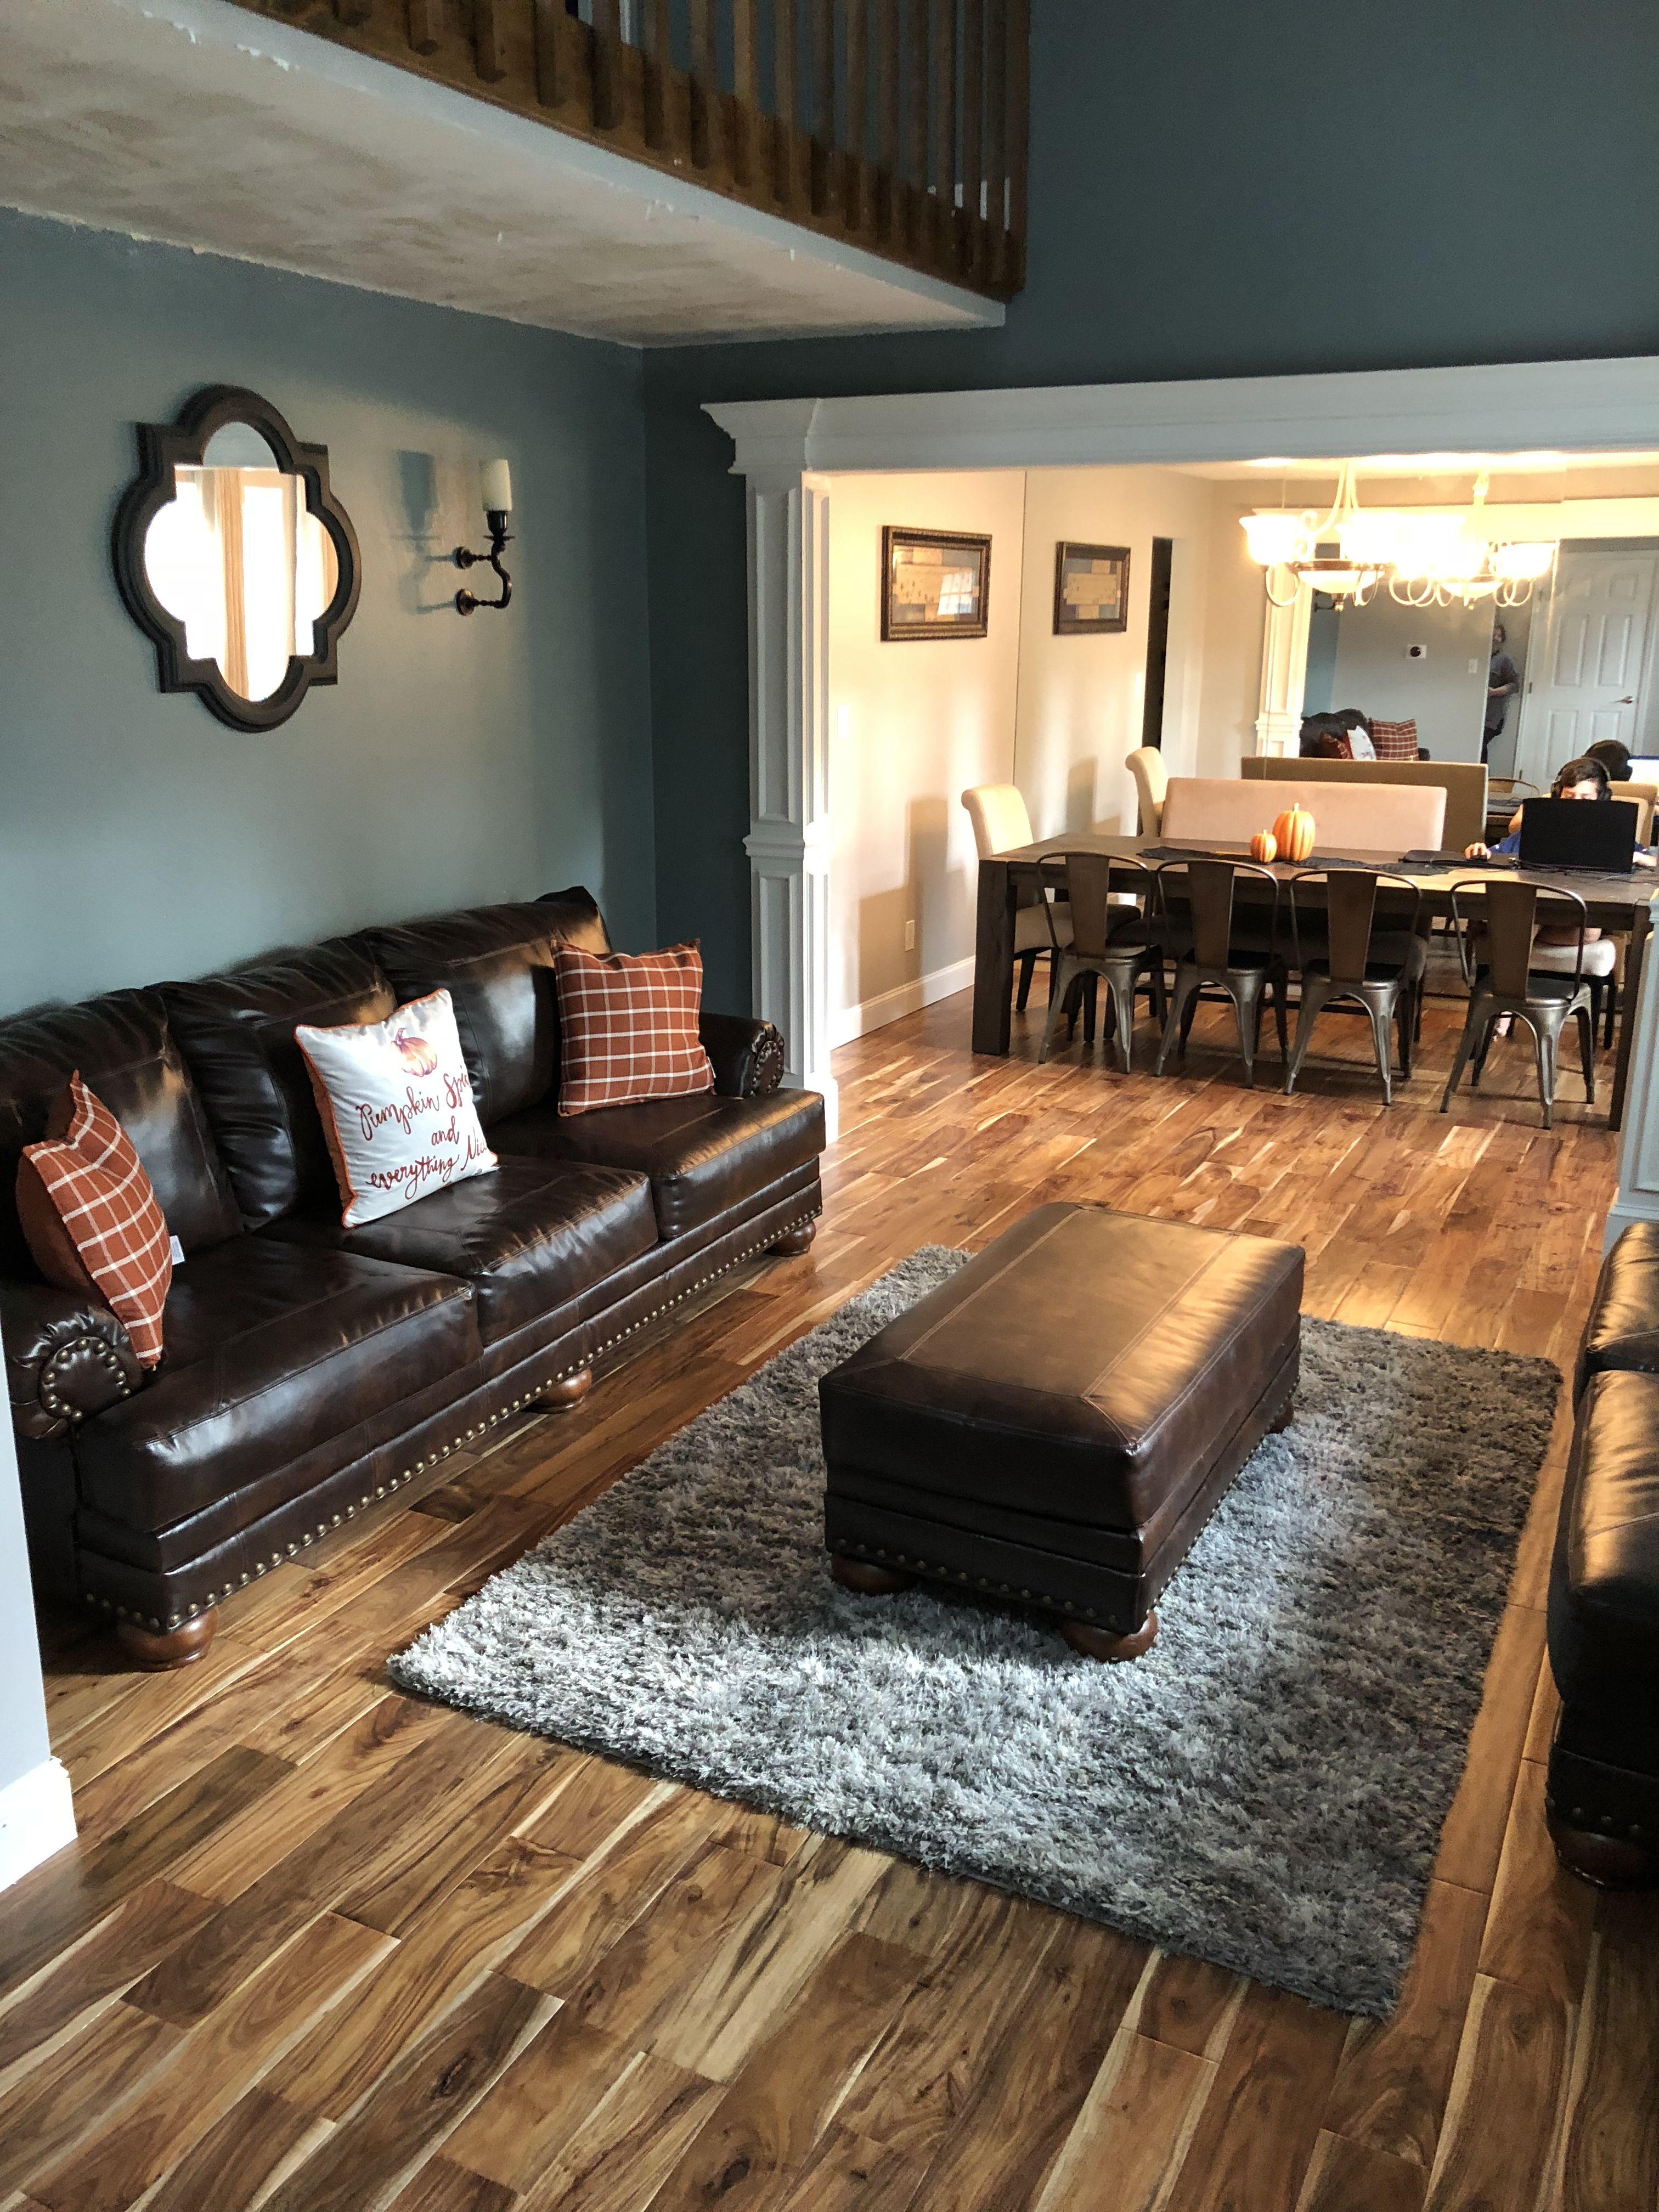 10+ Amazing Vinyl Flooring Ideas Living Room